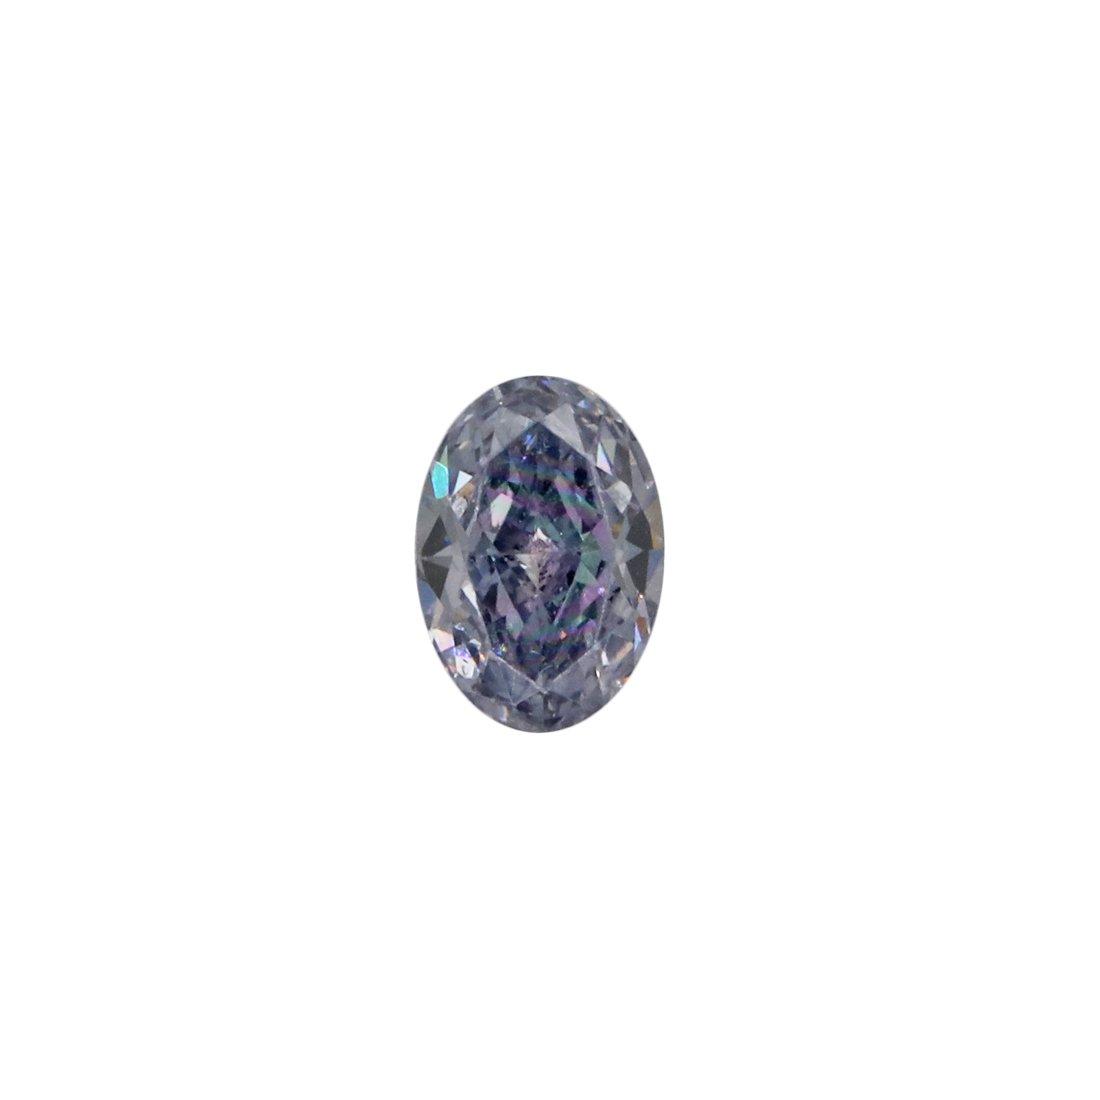 0.11ct Natural Fancy Intense Blue Grey, BL2+, VS2, Argyle Pink Diamond